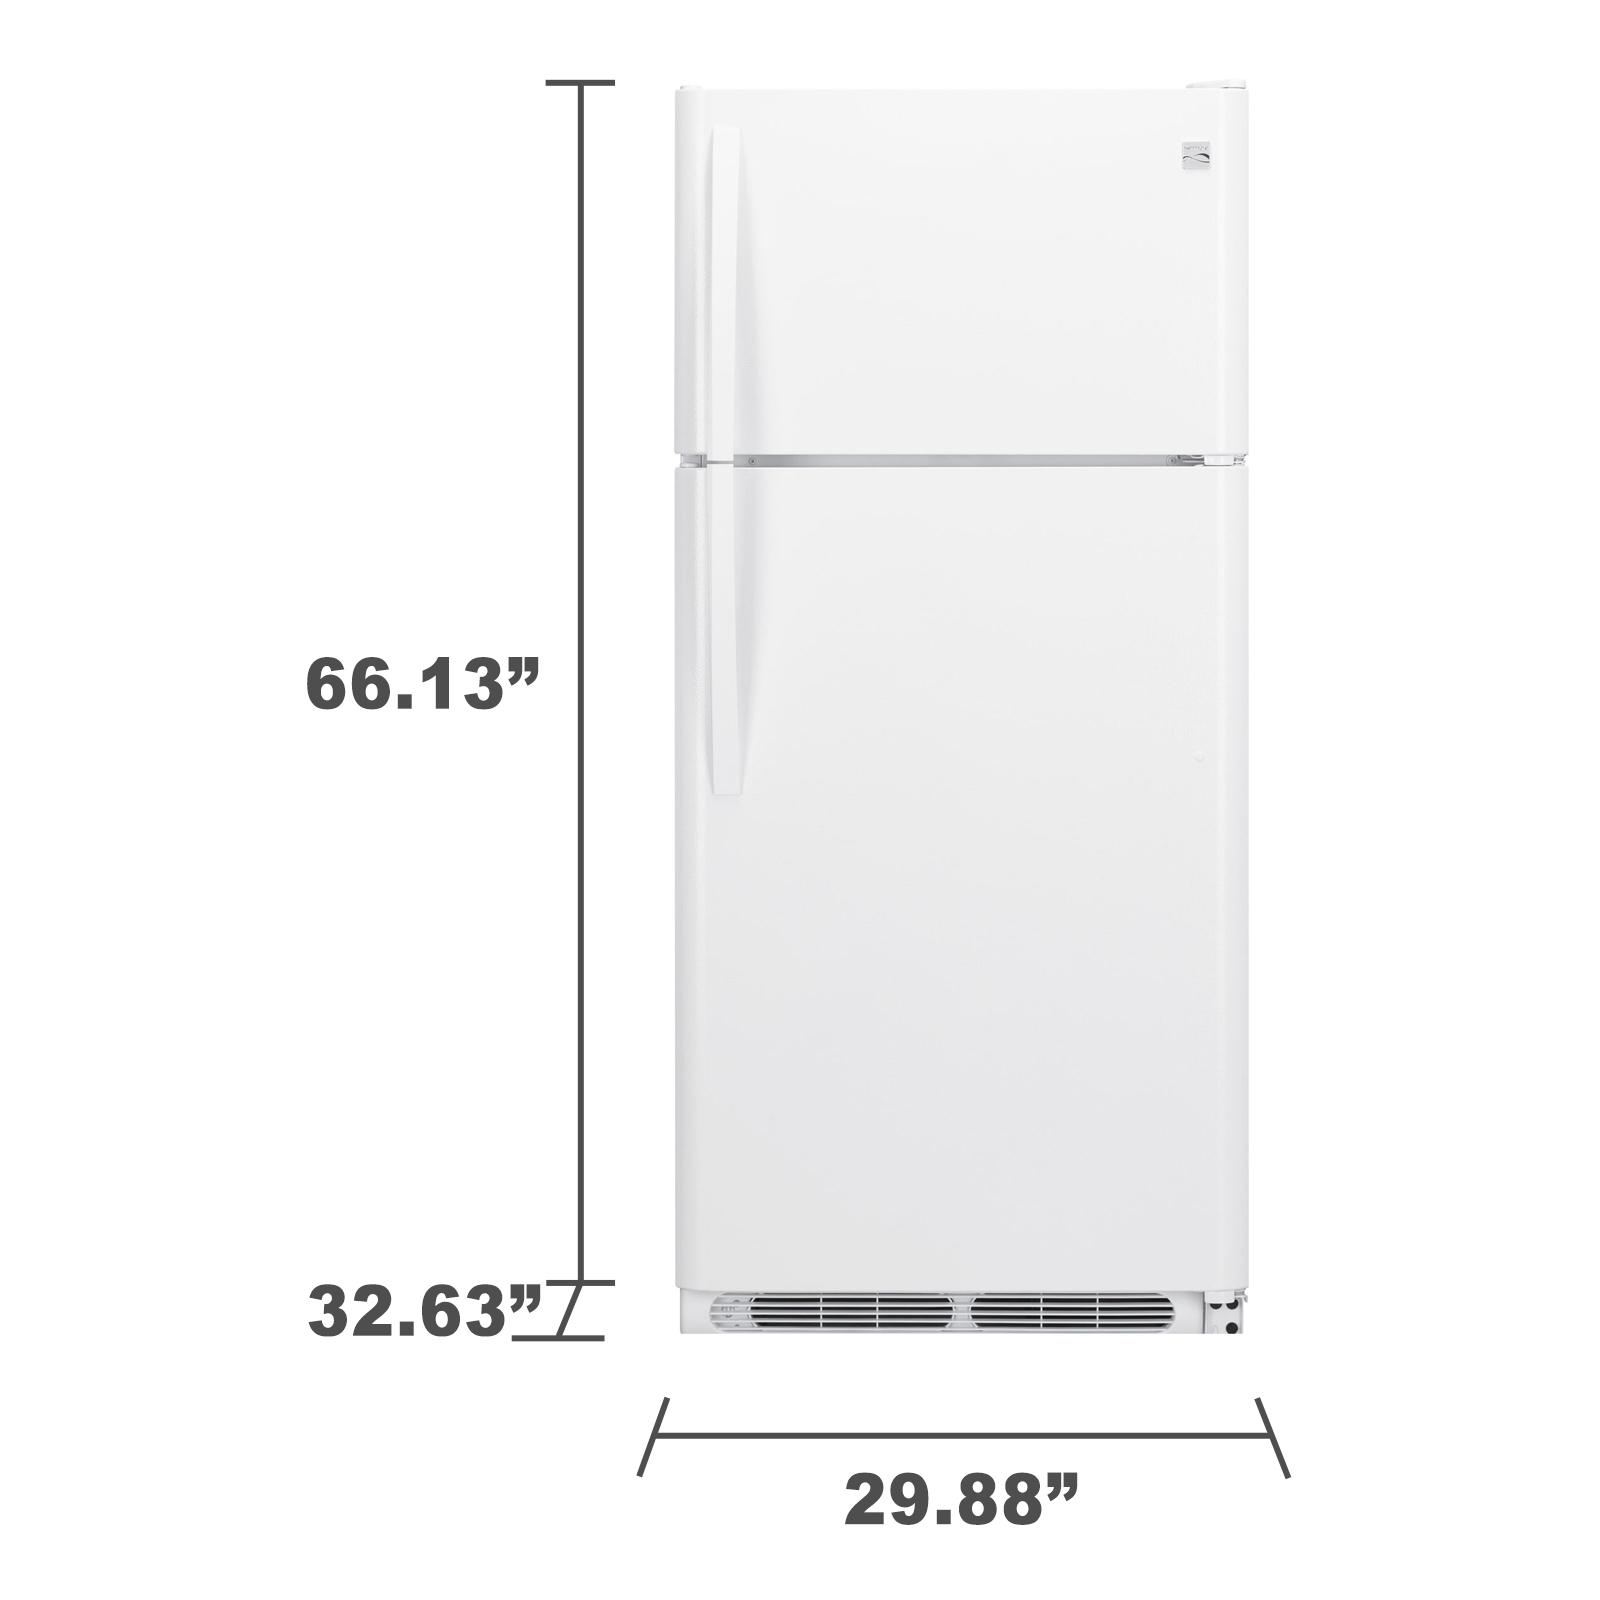 Kenmore 60602 18 cu. ft. Top Freezer Refrigerator - White